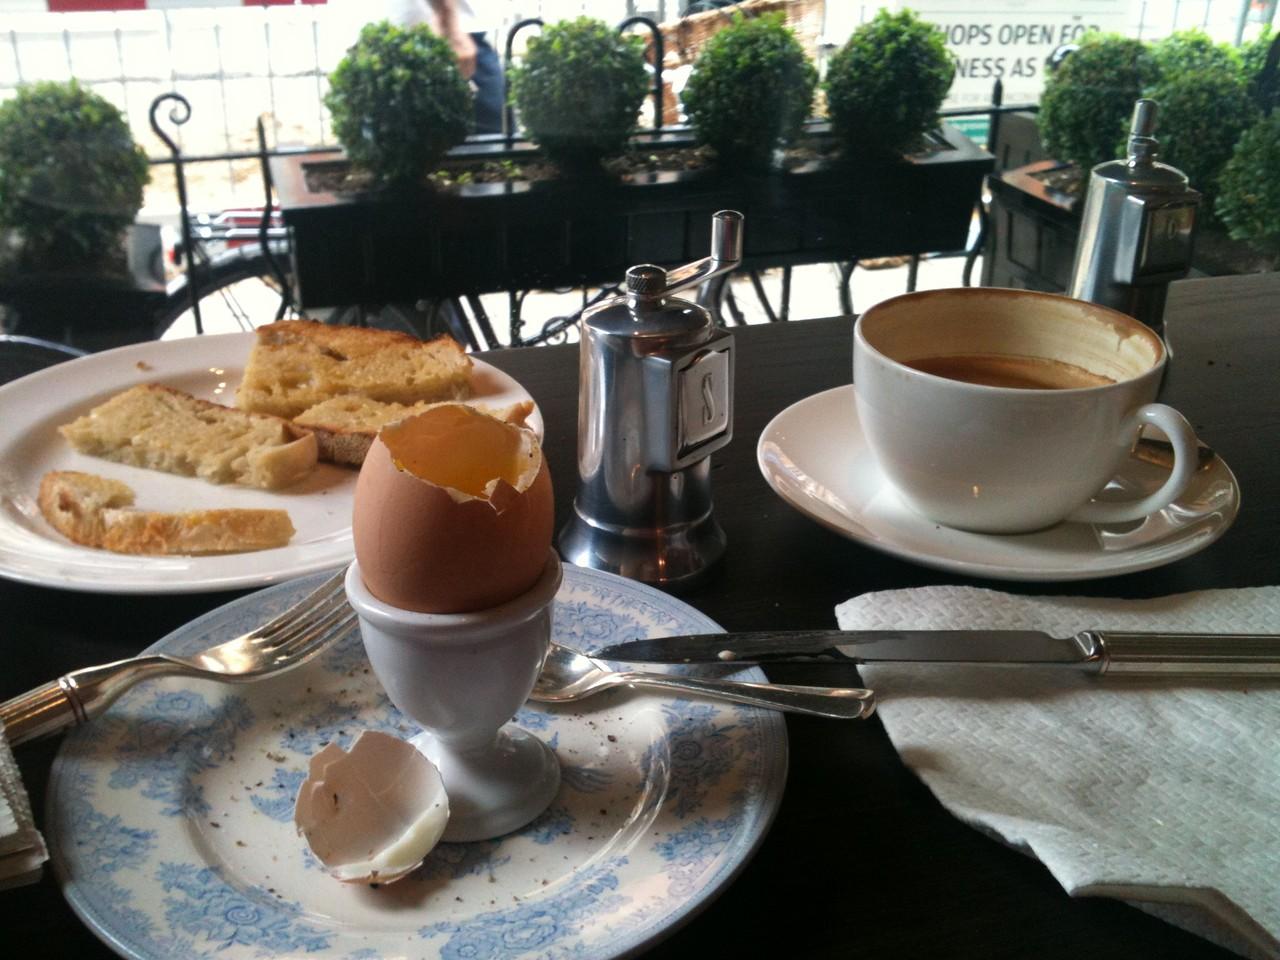 Awesome Breakfast@Mount Street Deli - London, United Kingdom